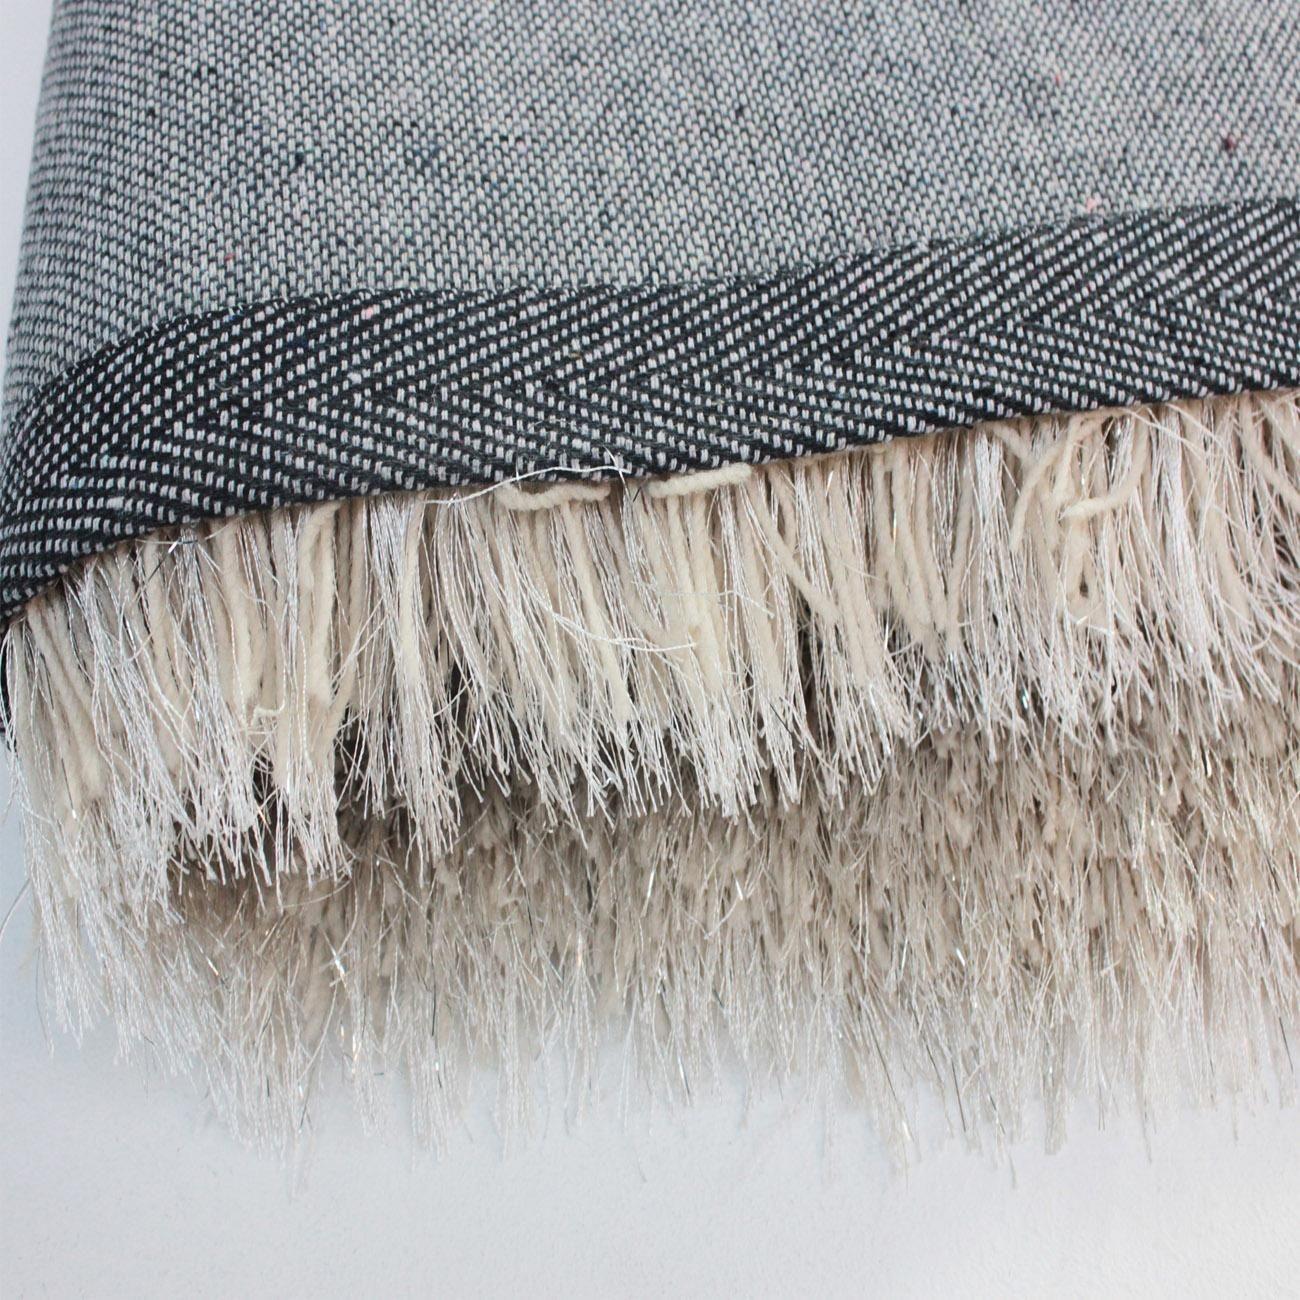 Flair Rugs Dazzle Natural Plain Shaggy Sparkle 160 x 230 cm